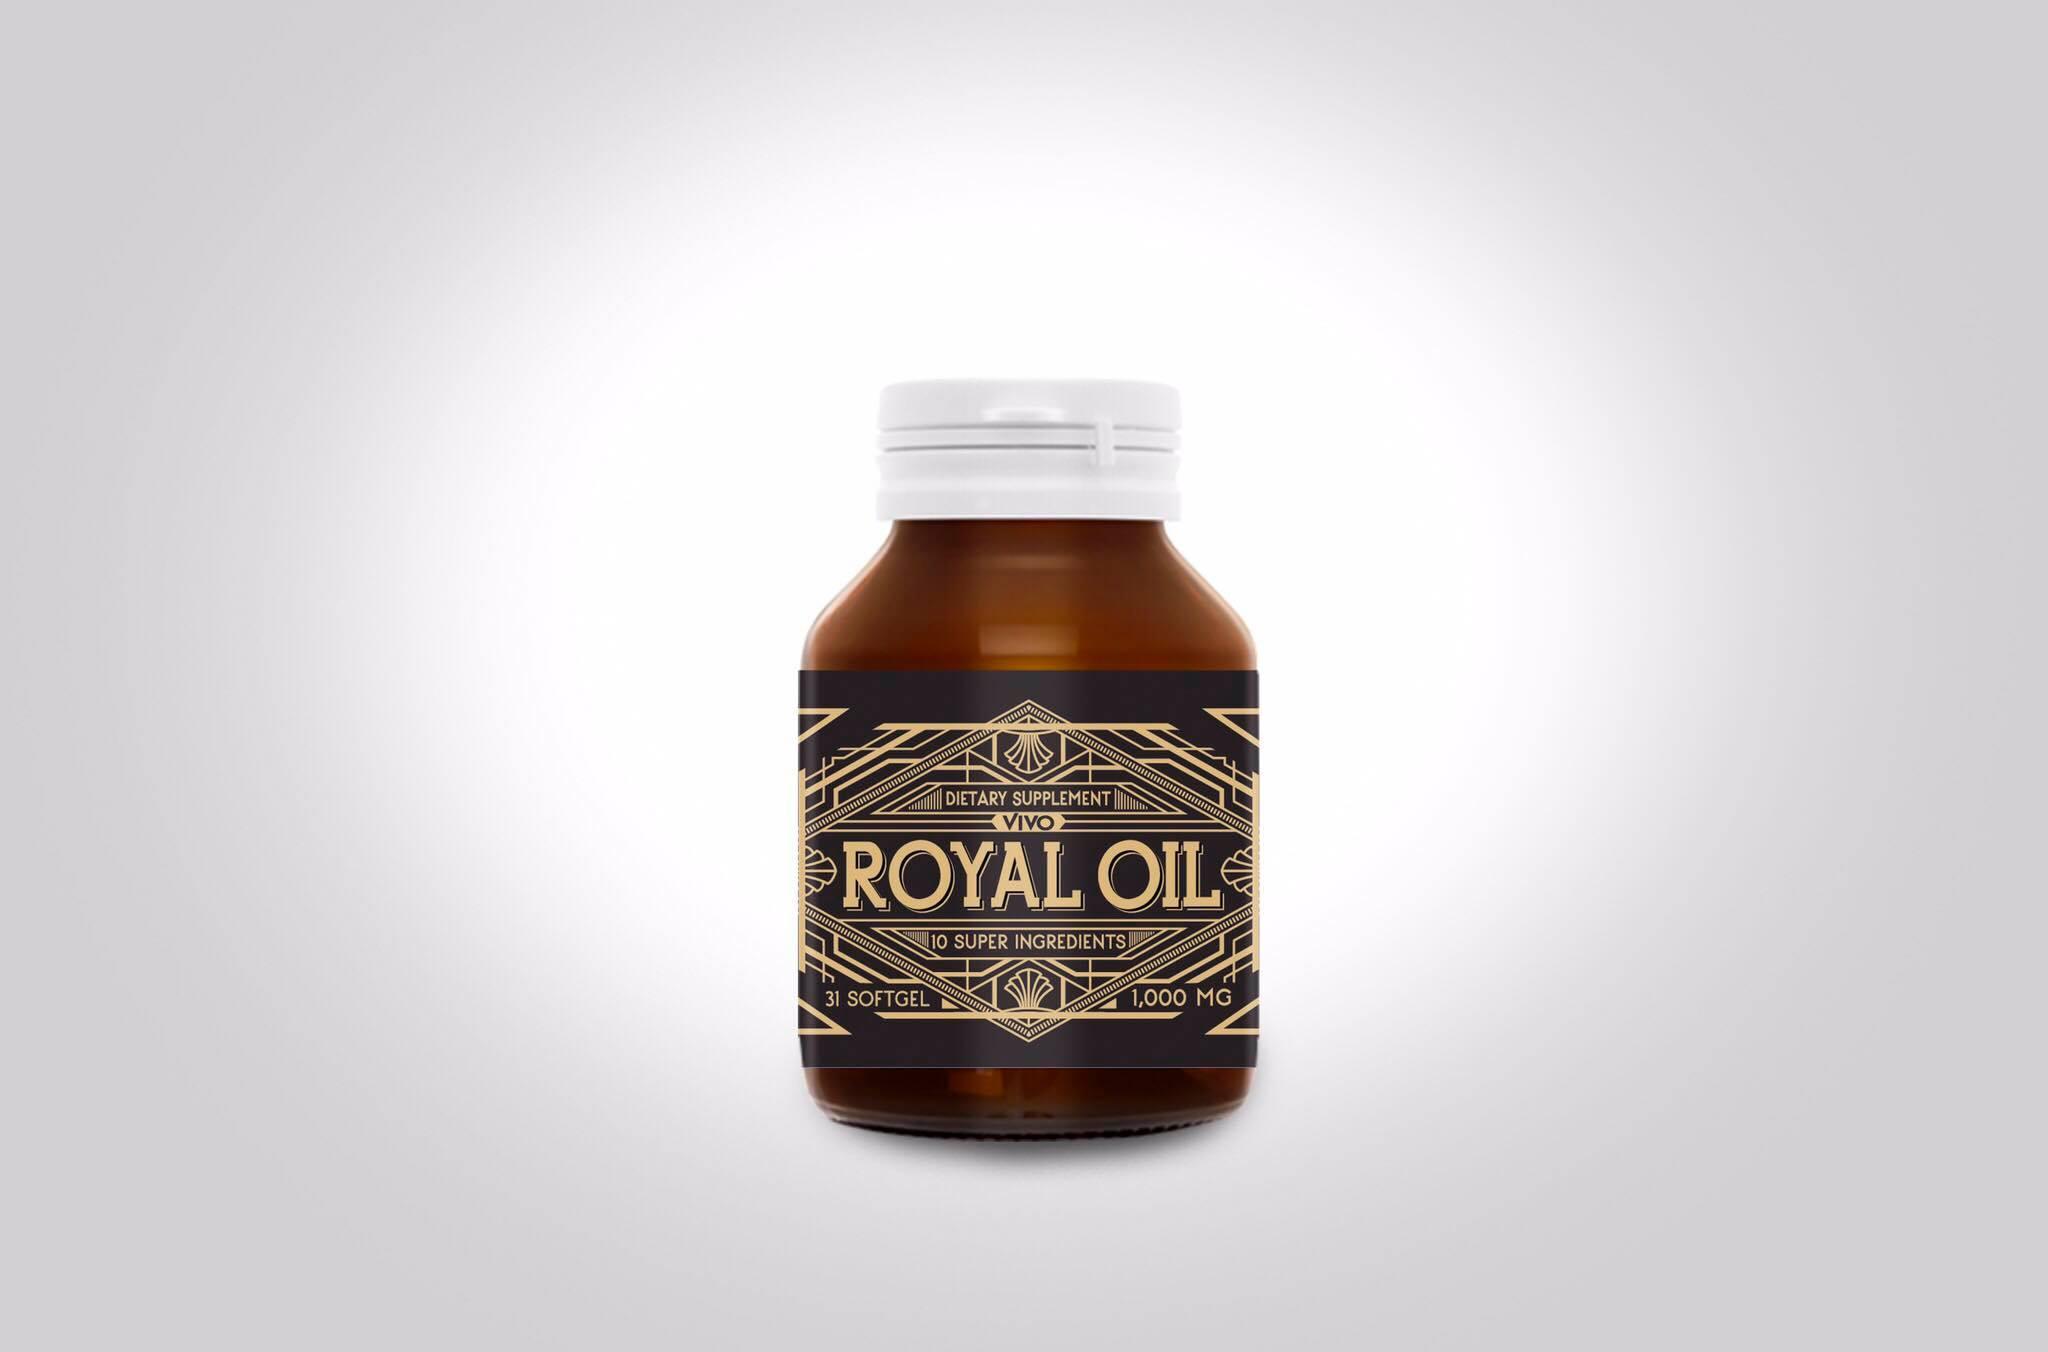 ROYAL OIL